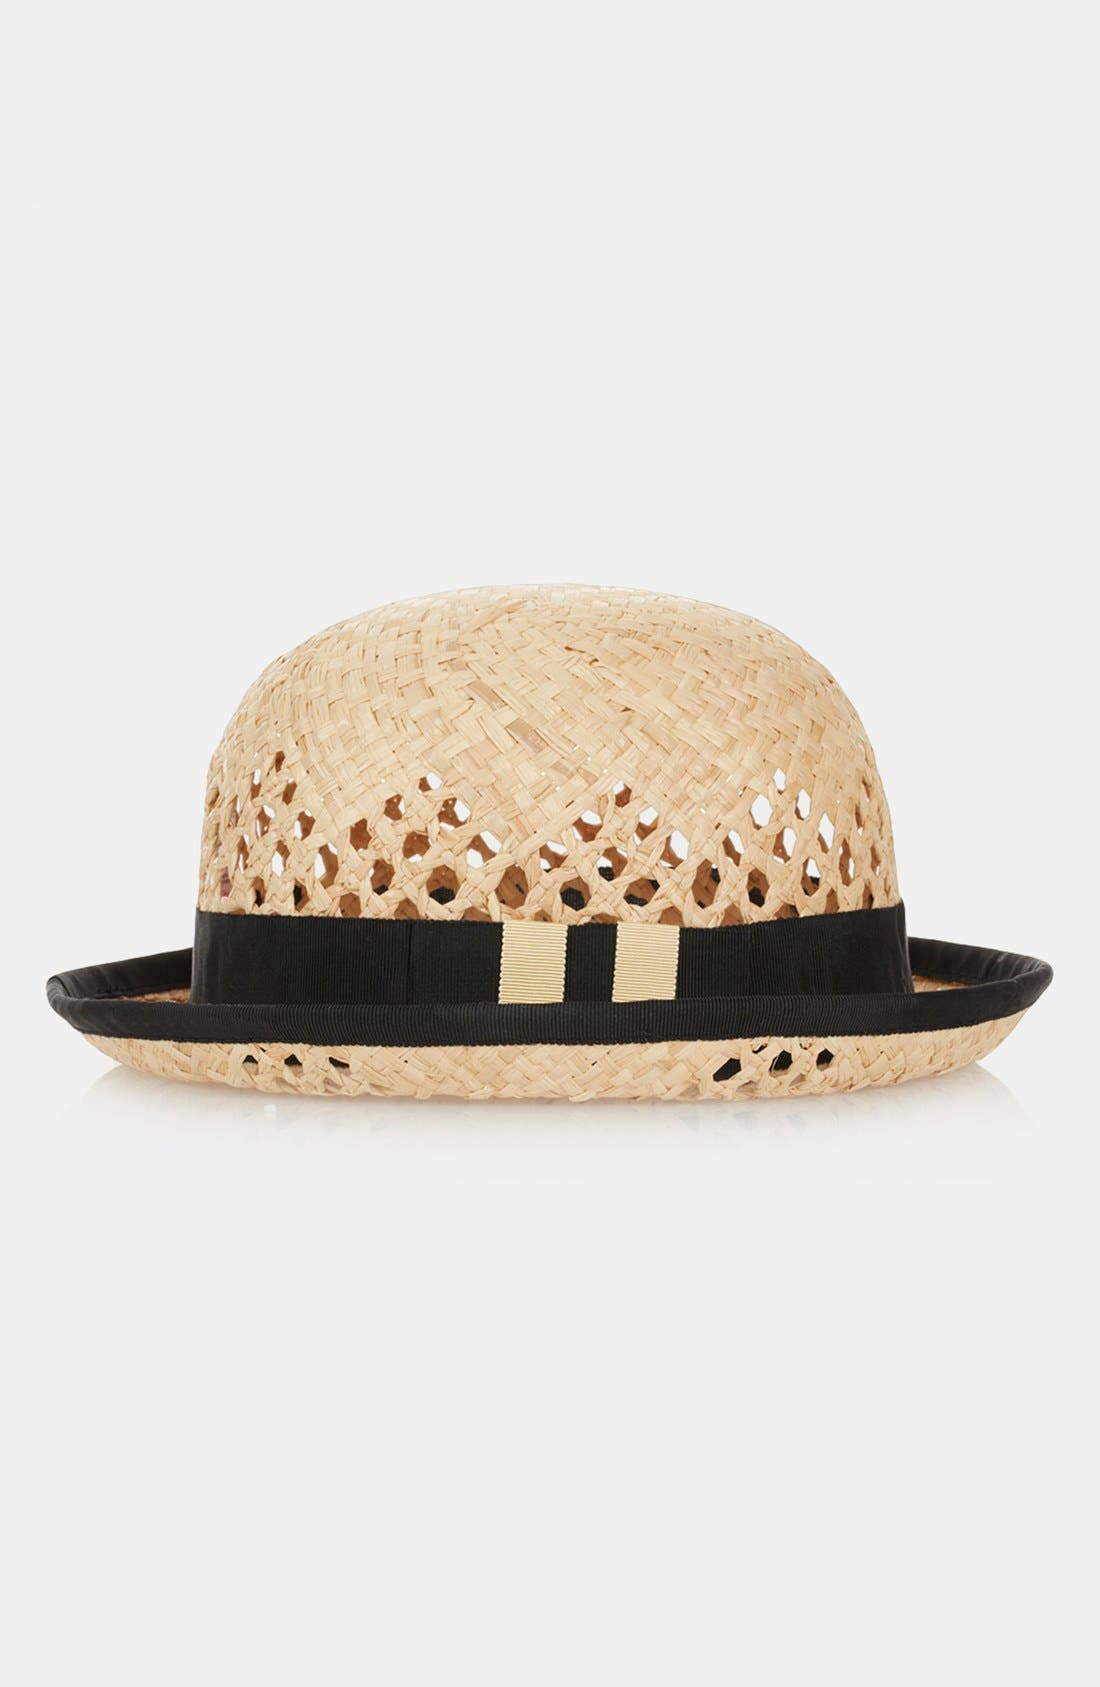 Alternate Image 1 Selected - Topshop Straw Bowler Hat